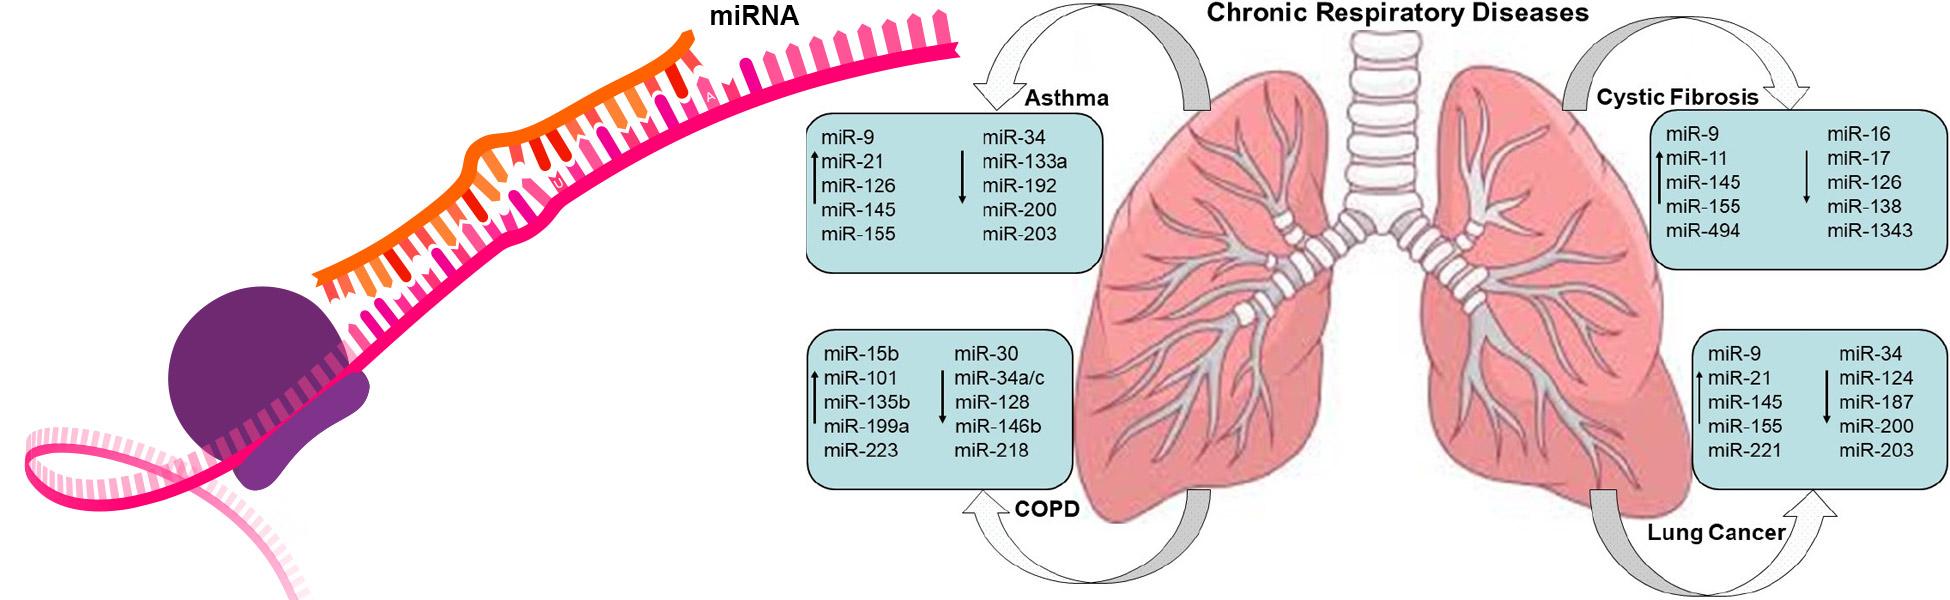 """Targeting respiratory diseases using miRNA inhibitor based nanotherapeutics: Current status and future perspectives"" M. Mehta, S. Satija, K. R. Paudel, V. Malyla, V. K. Kannaujiya, D. K. Chellappan, M. Bebawy, P. M. Hansbro, P. R. Wich, K. Dua, Nanomedicine: NBM, 2020, 102303."